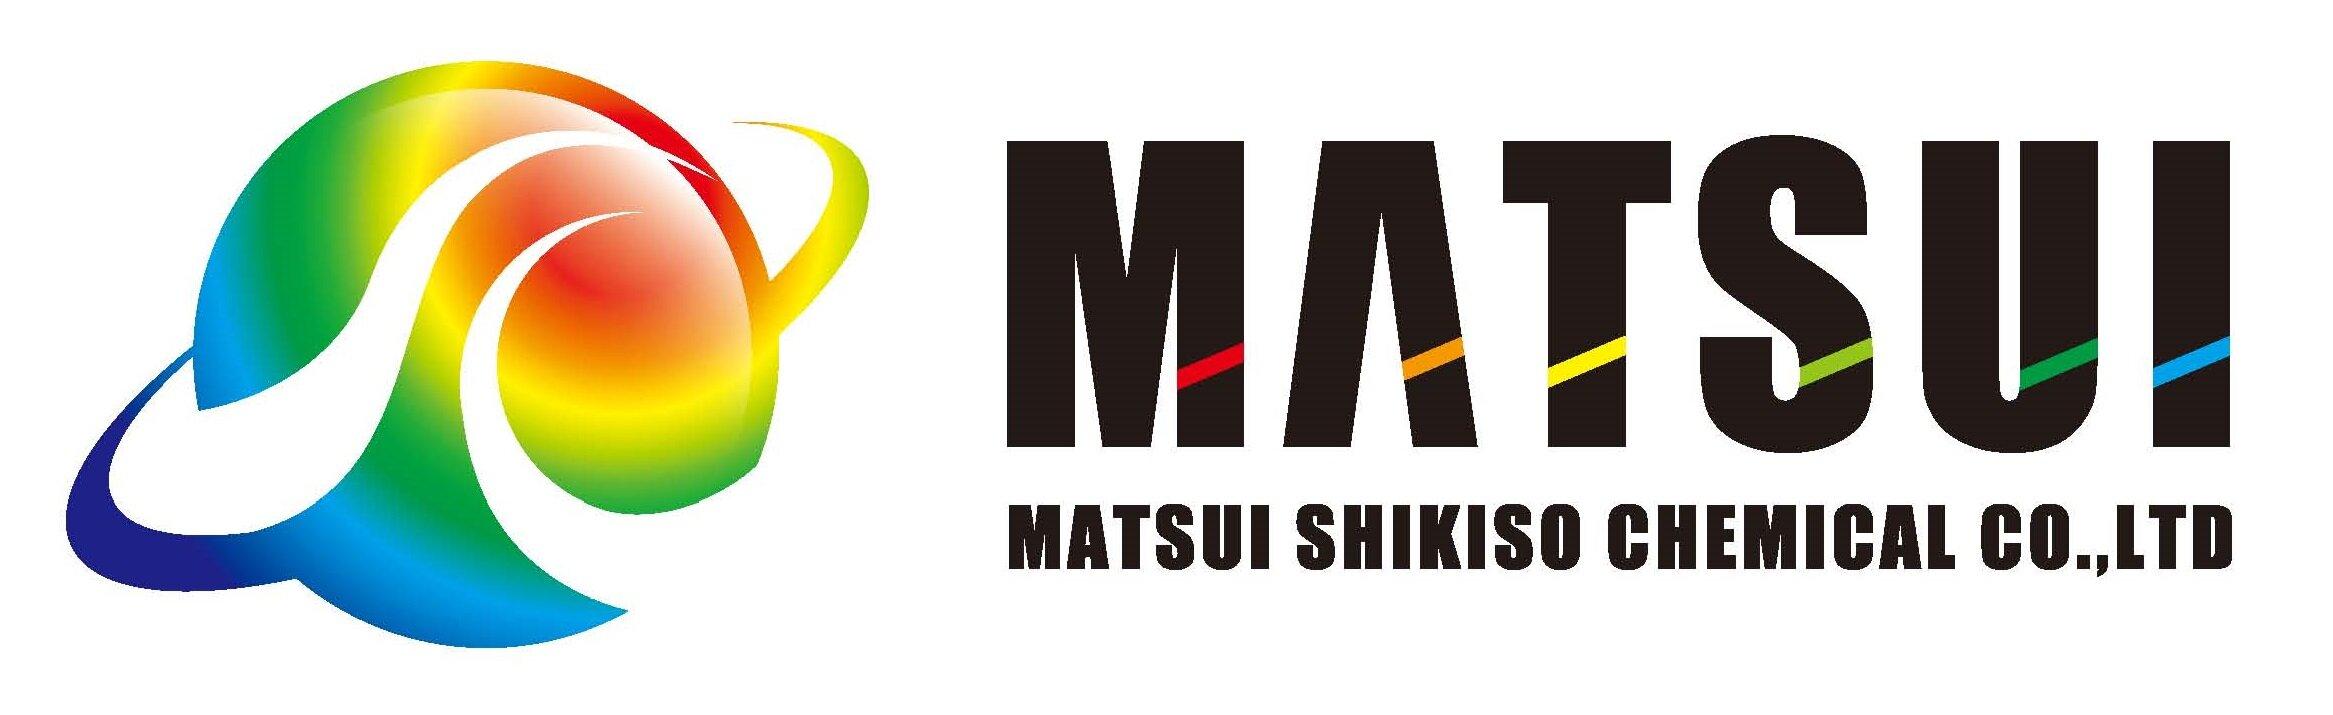 2. Matsui.jpg